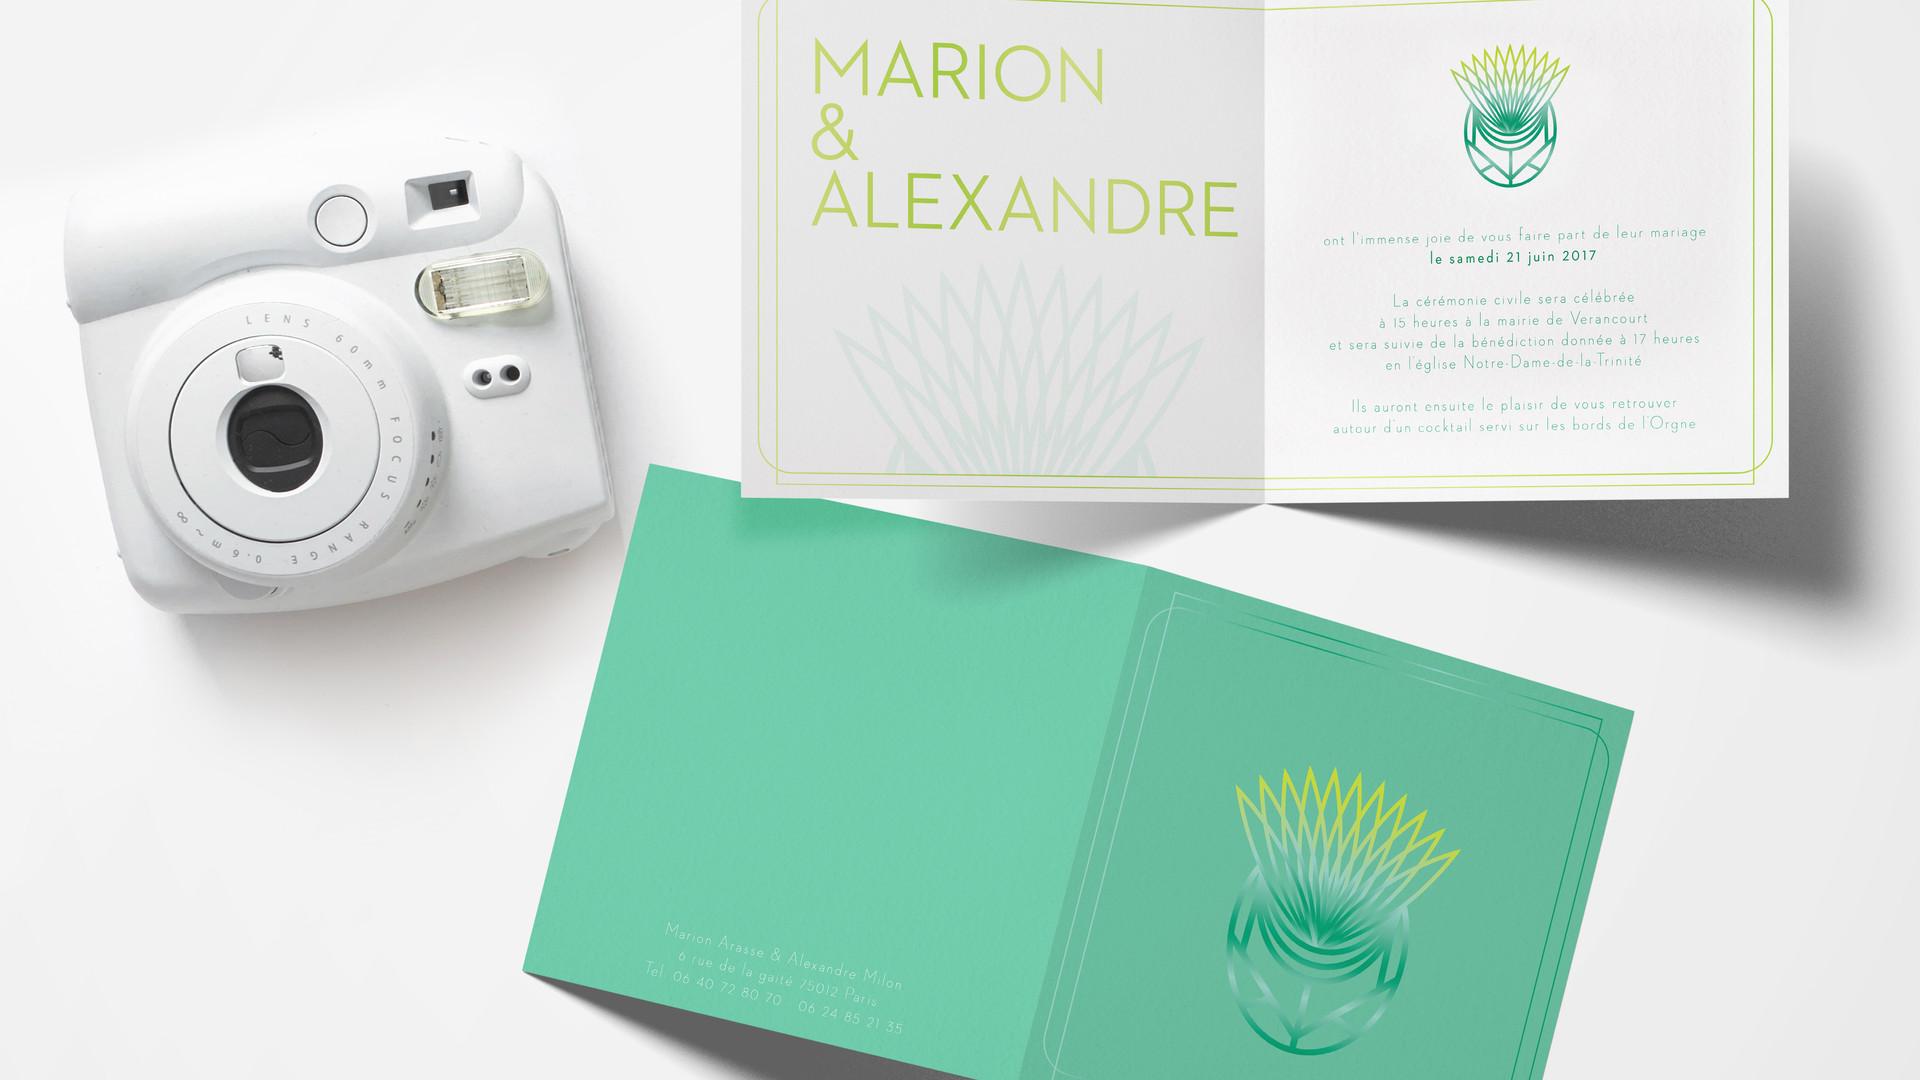 Marion & Alexandre